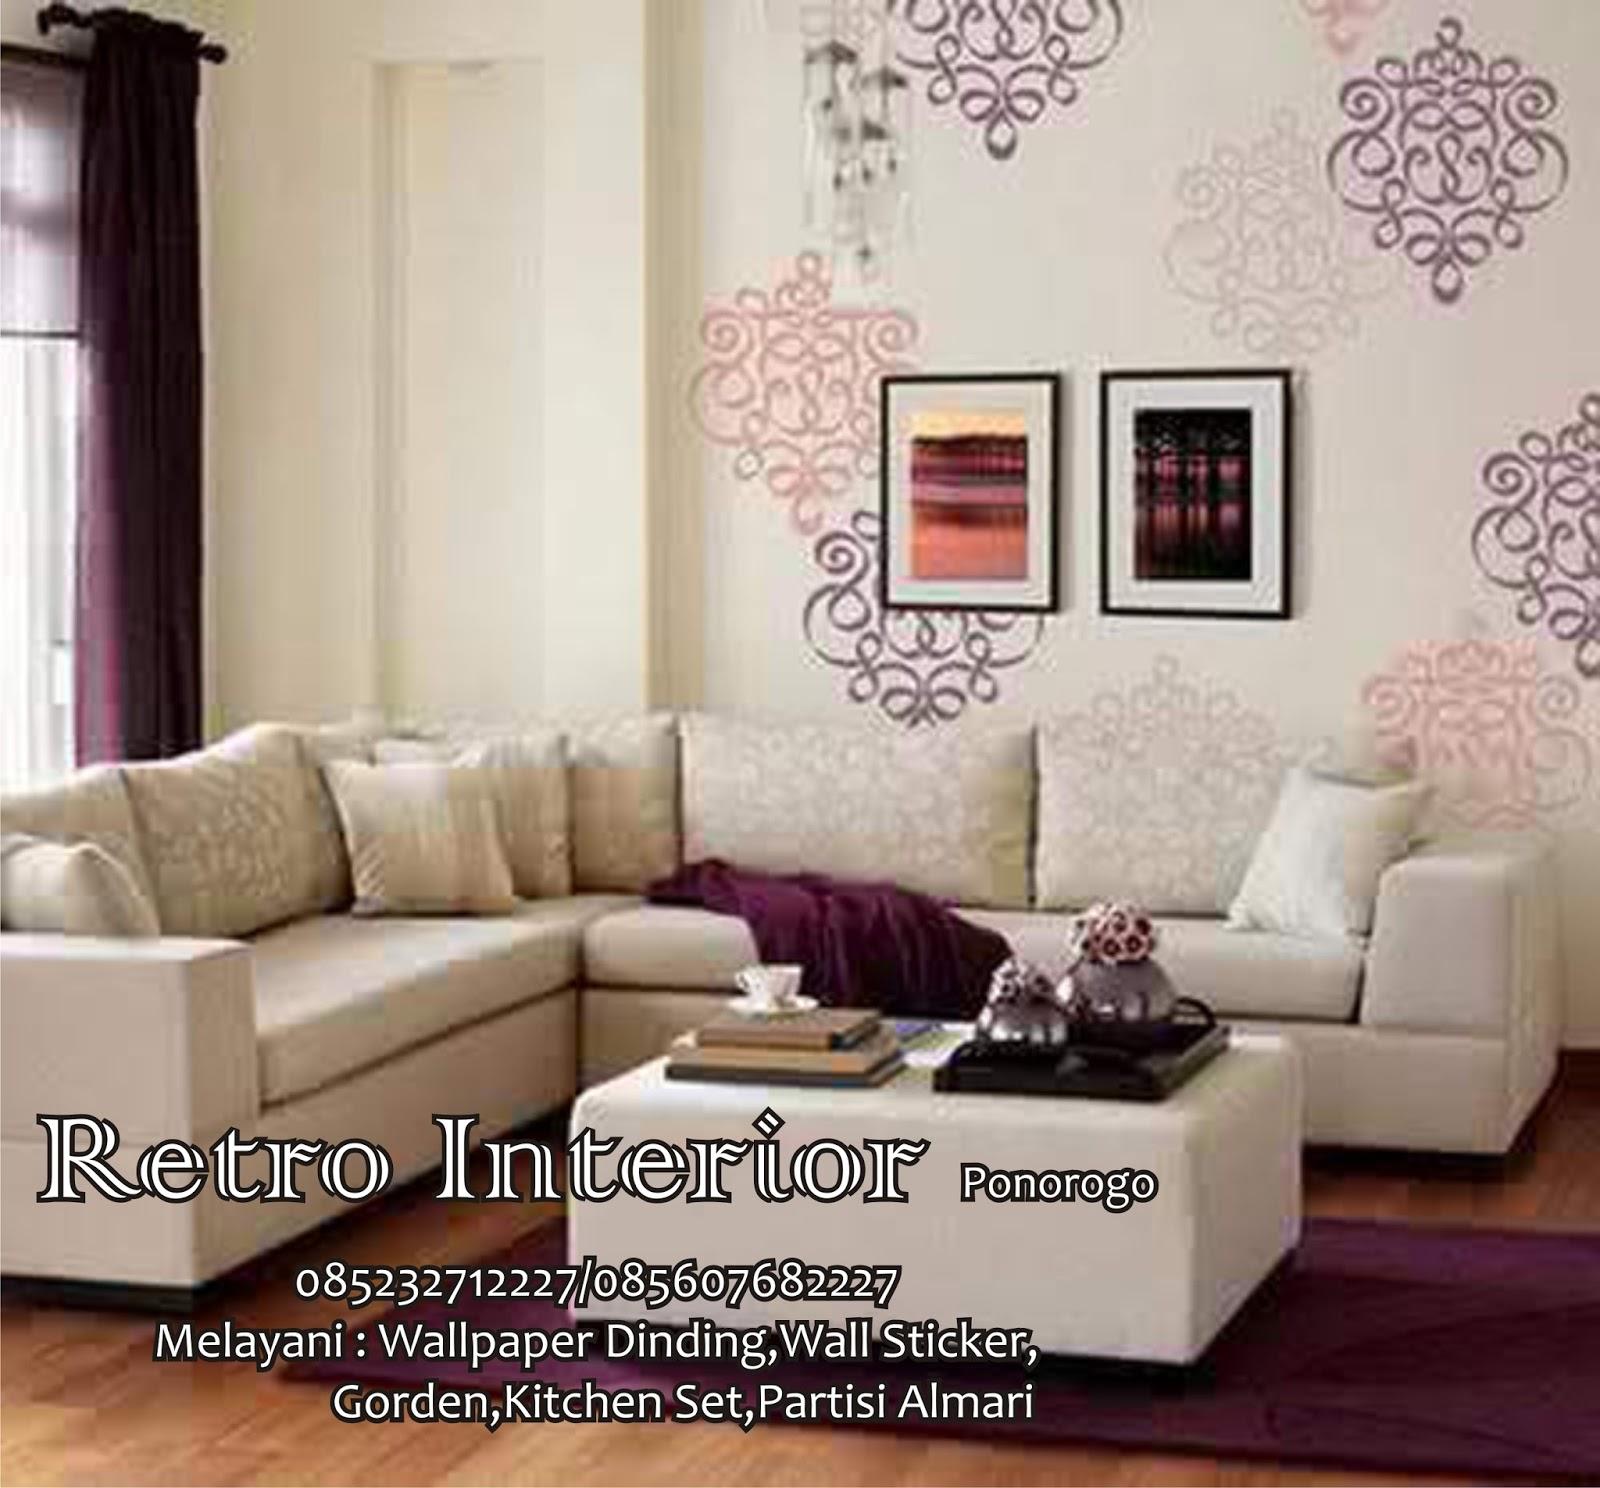 Toko Wallpaper Dinding Magetan 085232712227 085607682227 Pin Bb 5ecd728d Wa 081335372227 Harga Wallpaper Dinding Di Magetan